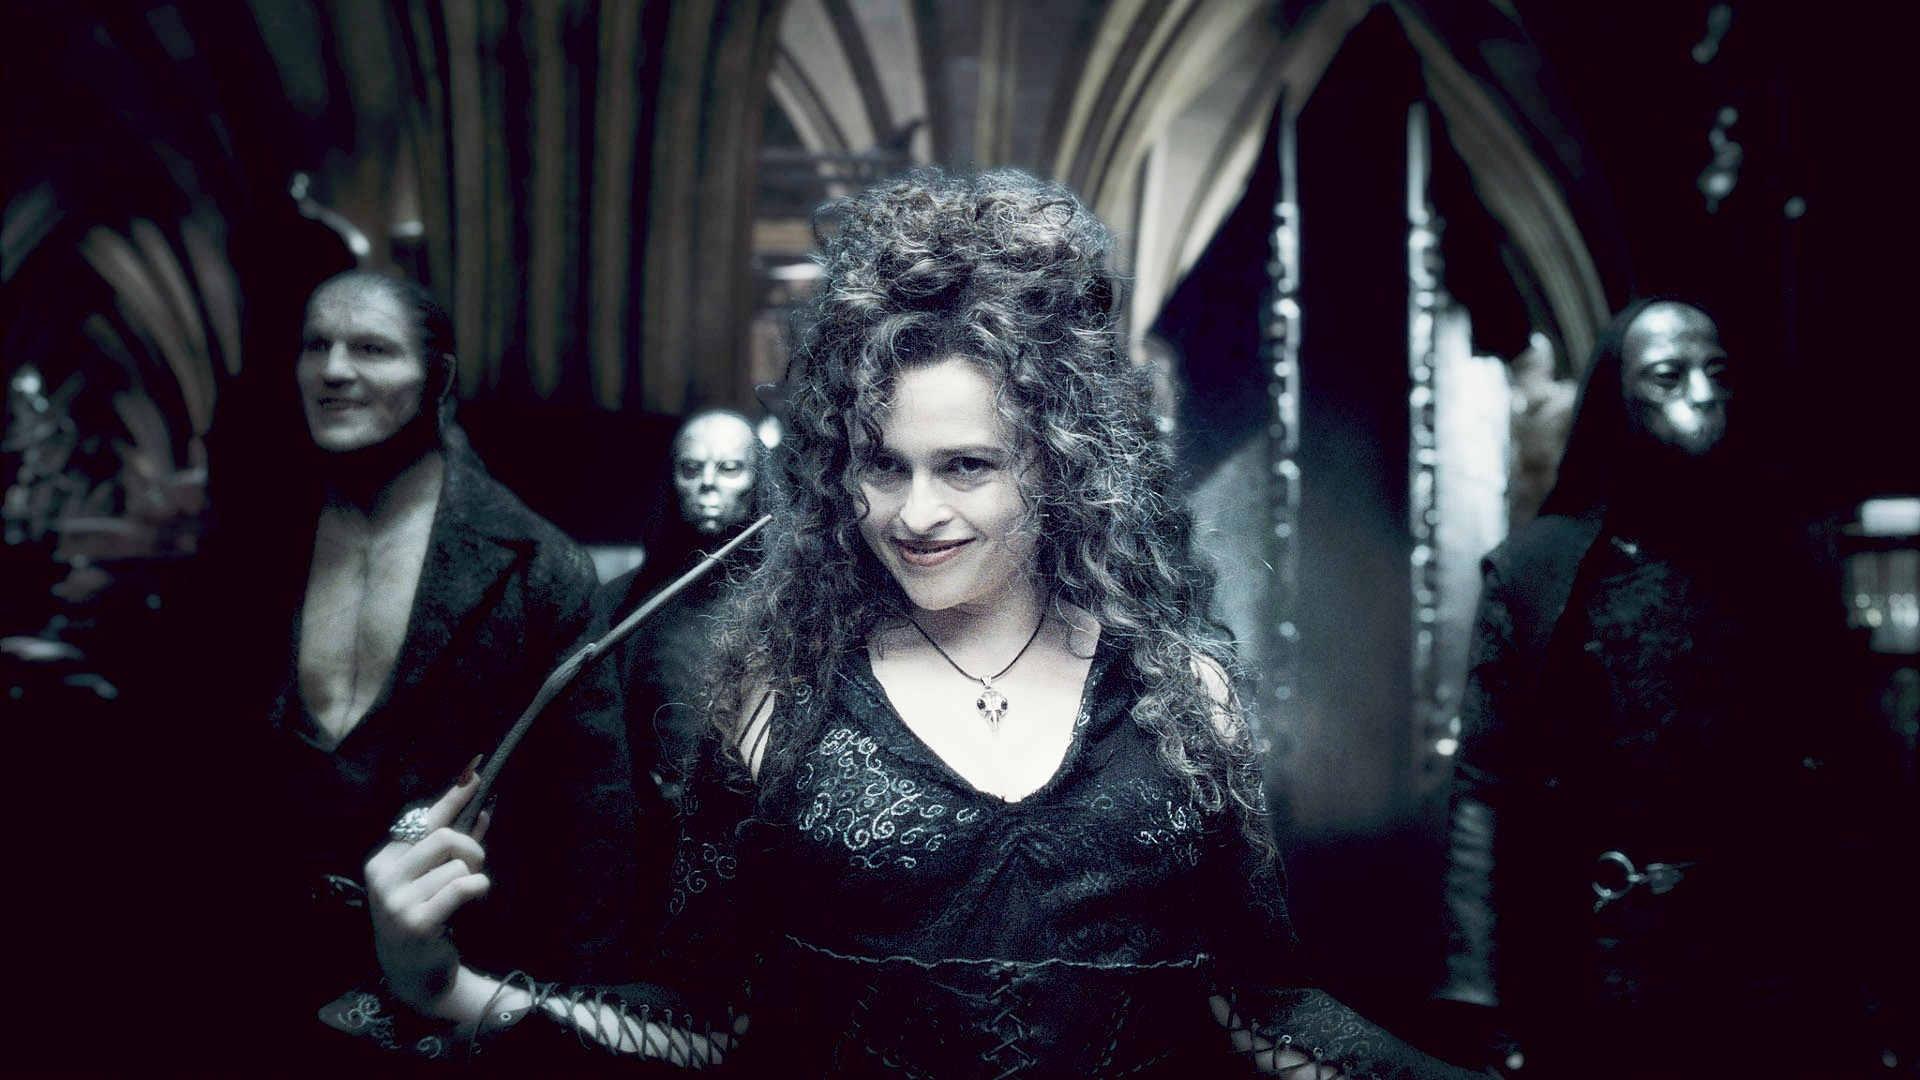 #68) Harry Potter and the Half-Blood Prince - (2009 - dir. David Yates)